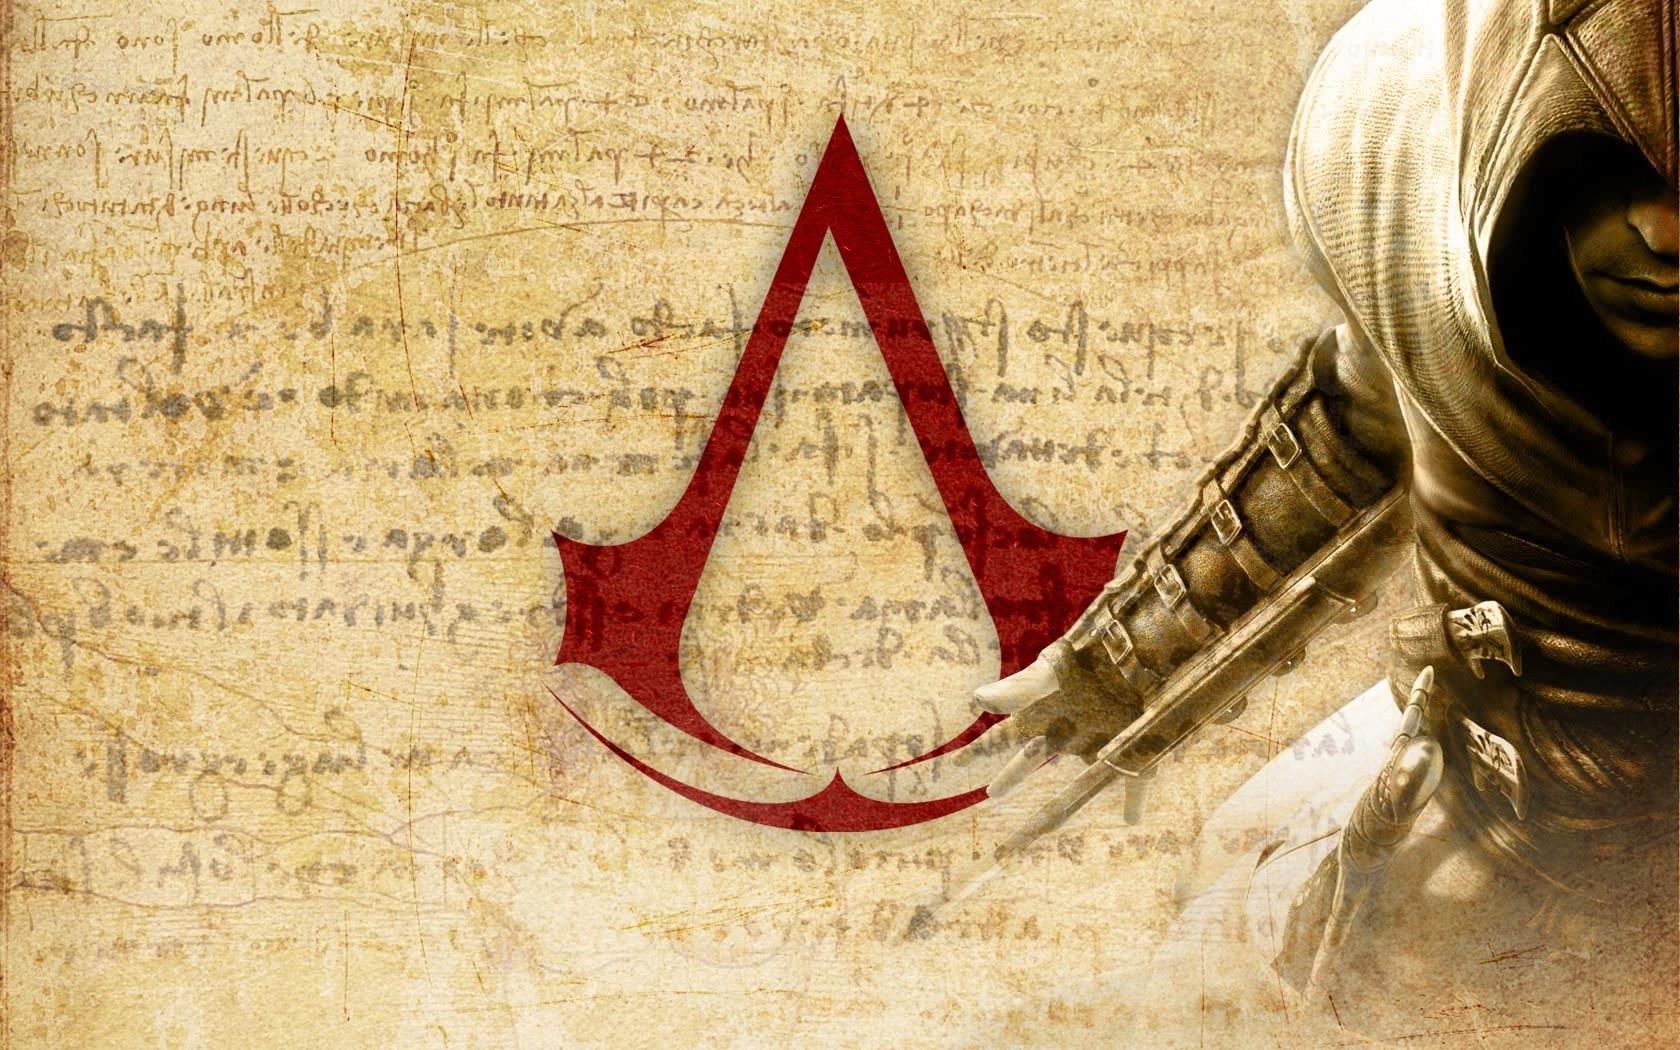 Assassins Creed Symbol Background Knife Hand Desmond Miles